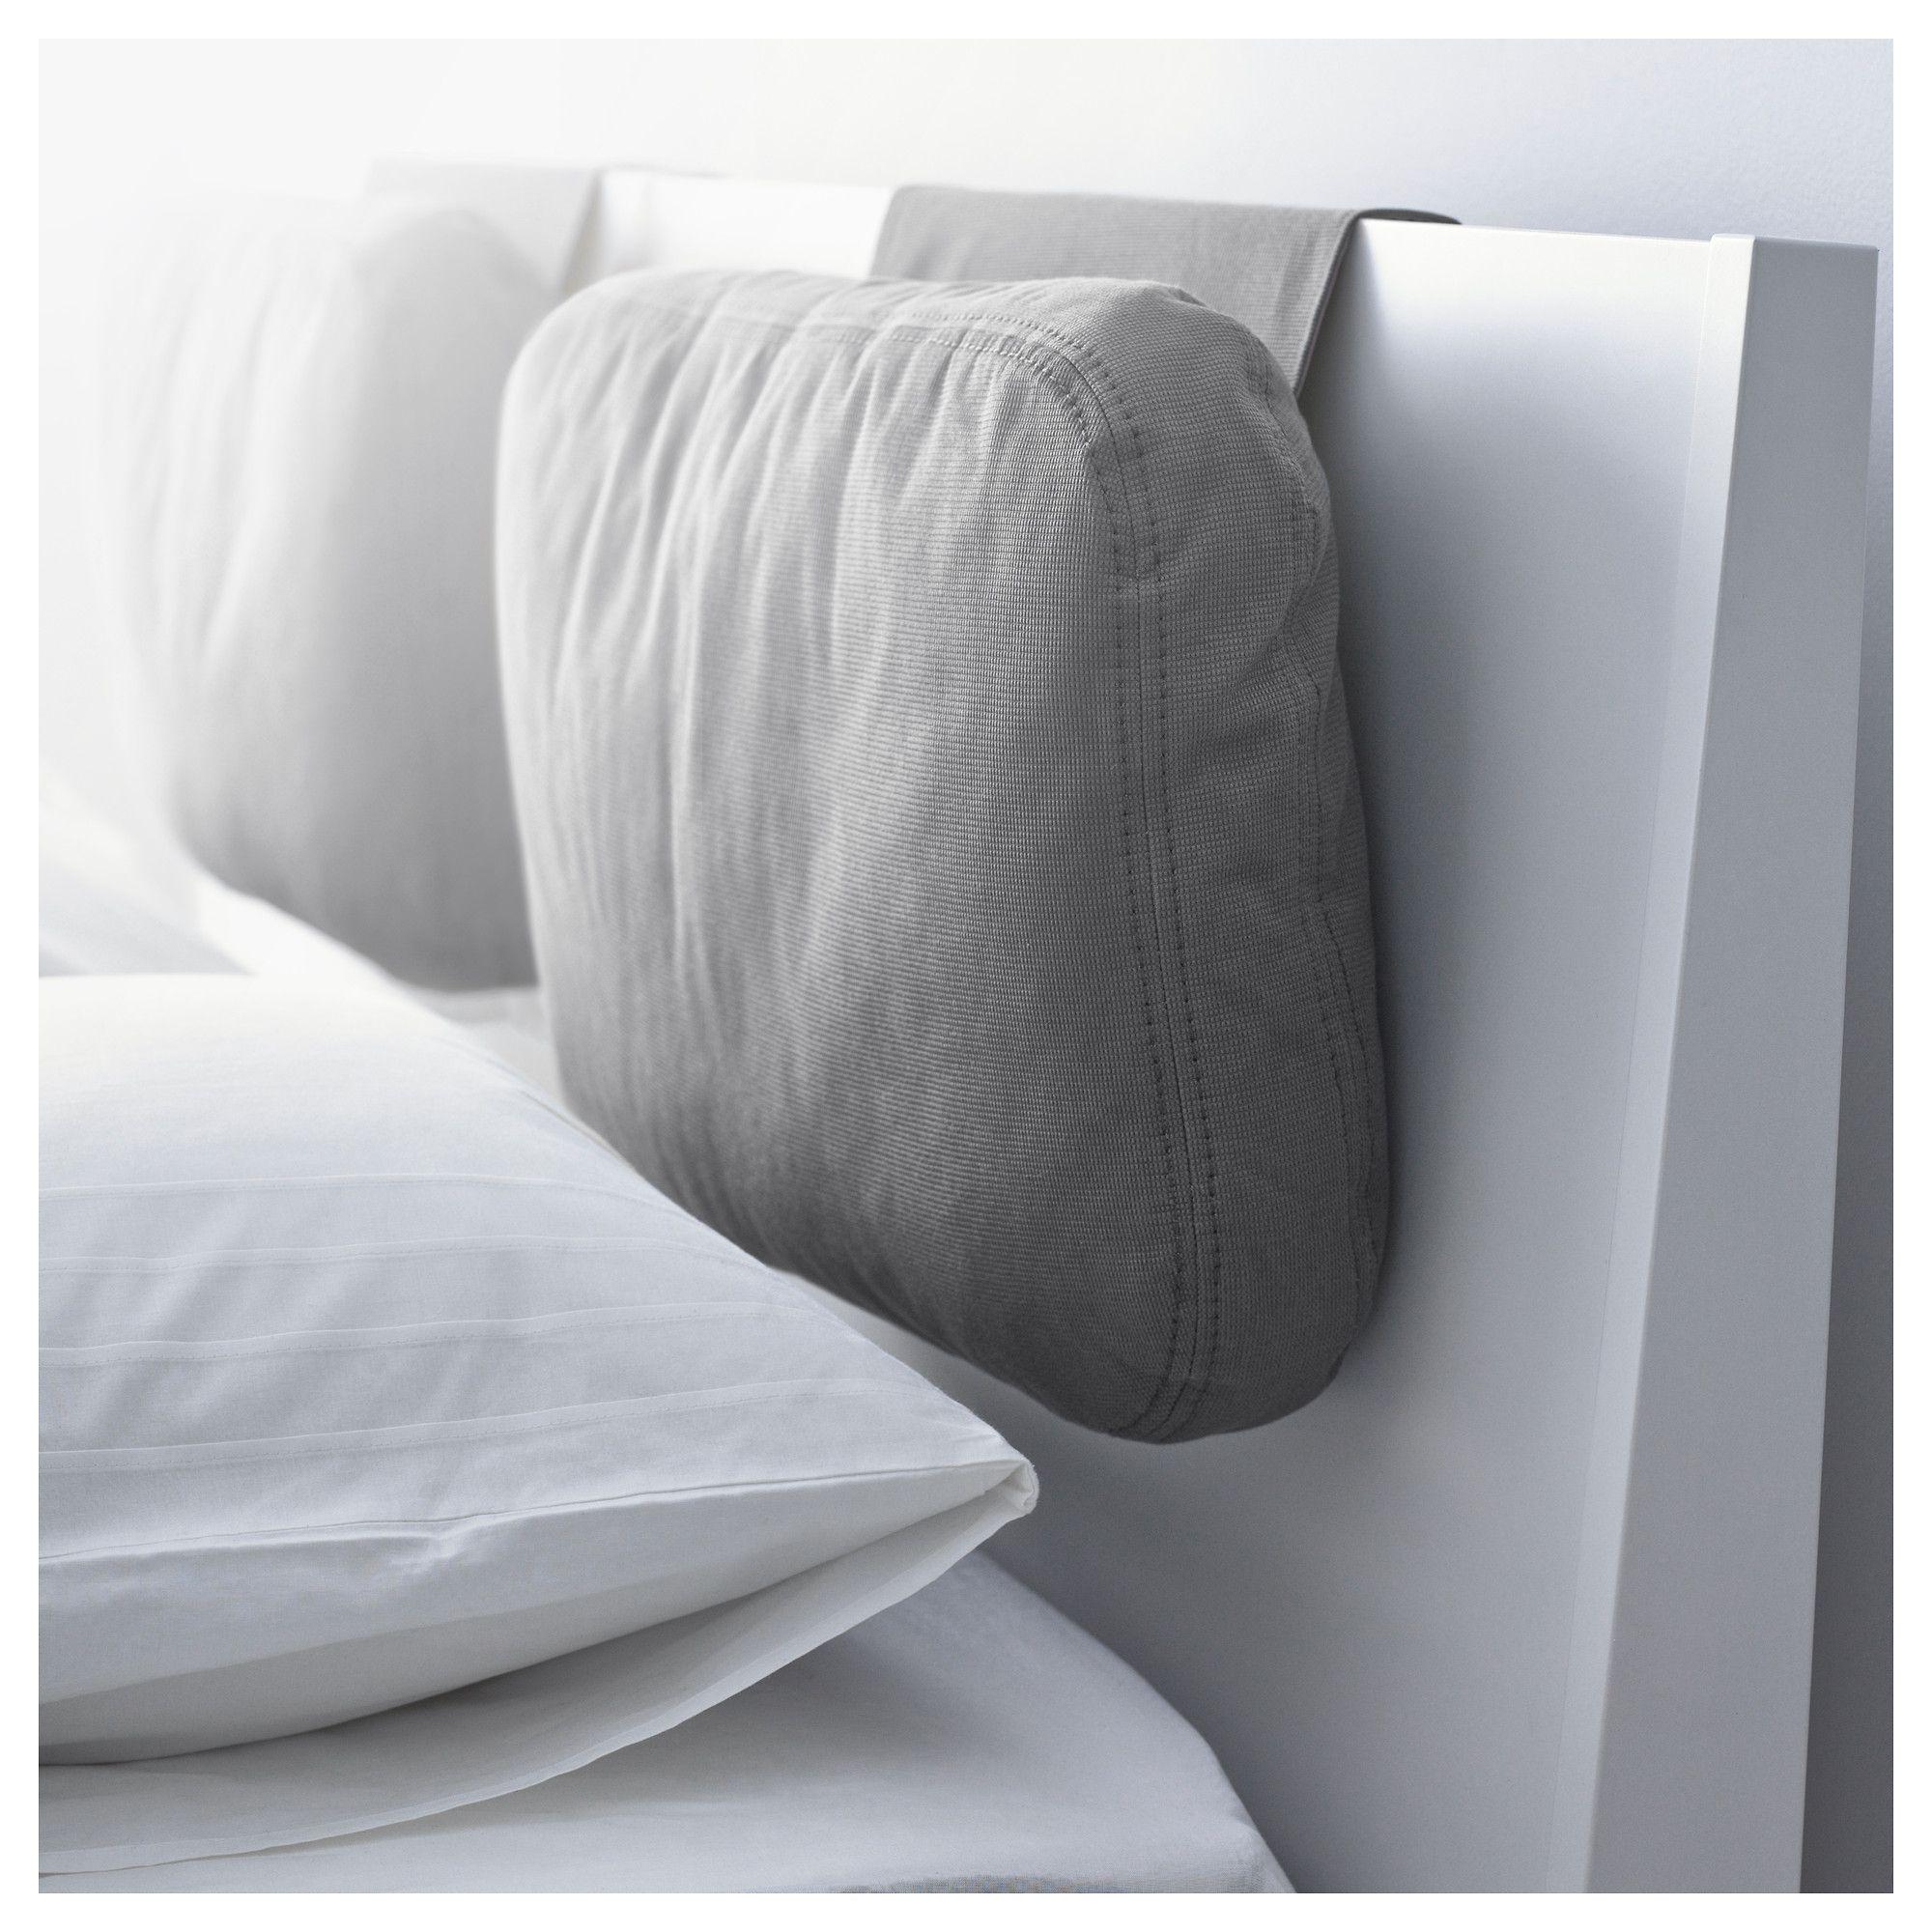 SKOGN Cushion - Röstånga gray - IKEA   products I like   Pinterest ...